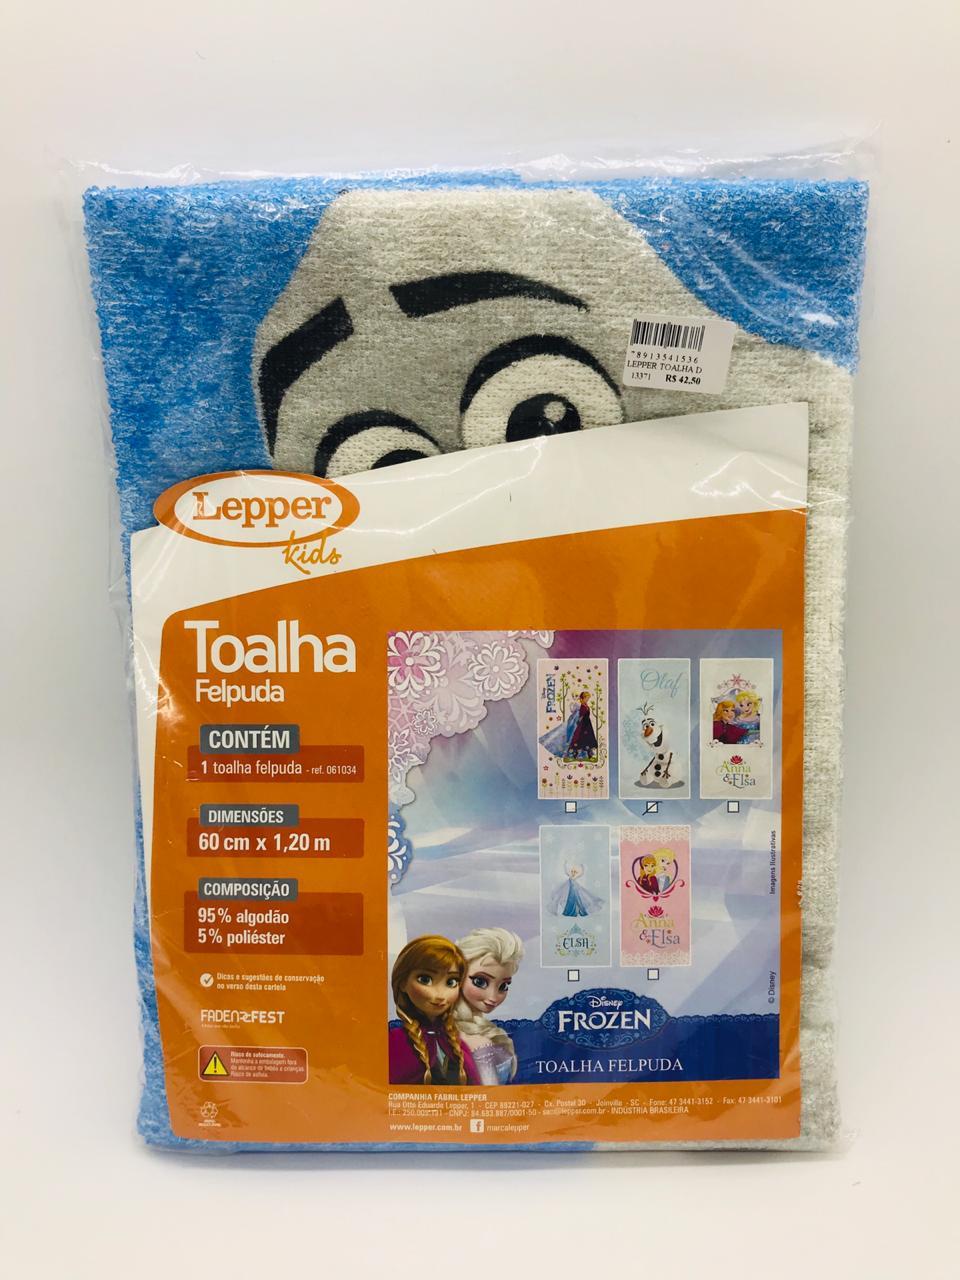 Toalha de Banho Felpuda Frozen Olaf - Lepper Kids Ref 061034